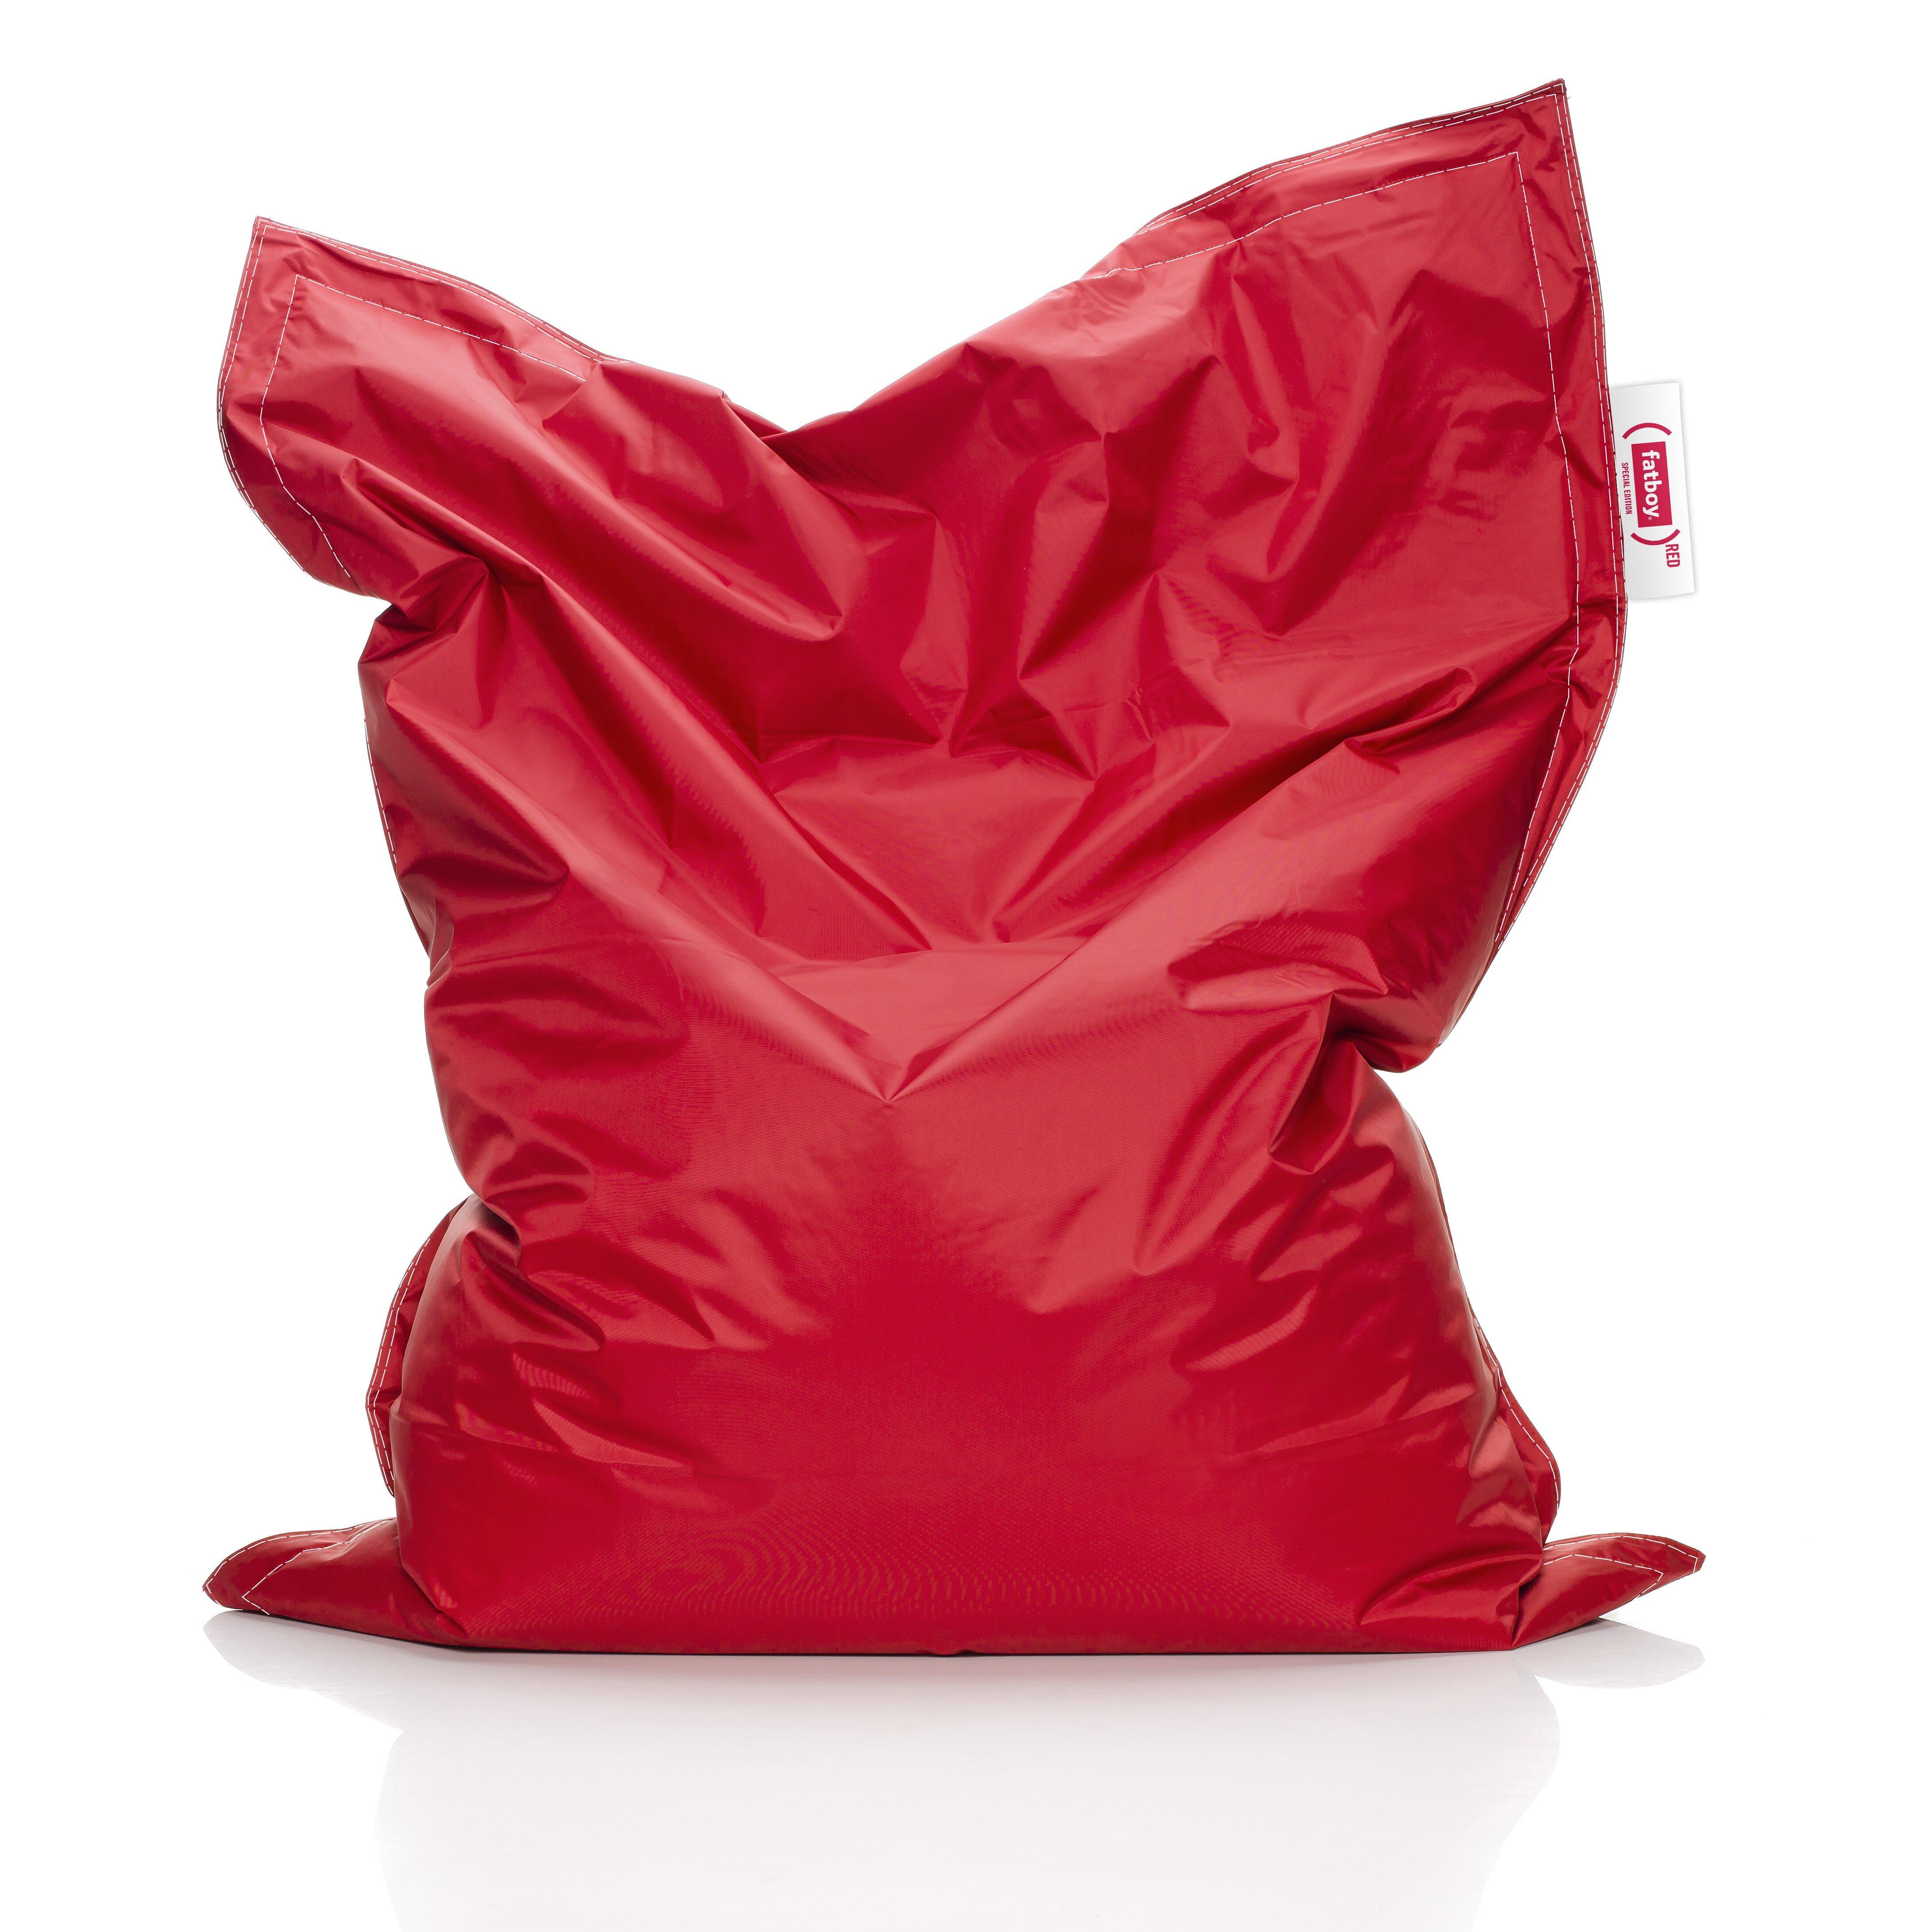 up photos bean fat fresh buggle of boy com fatboy bathgroundspath bag outdoor furniture bags